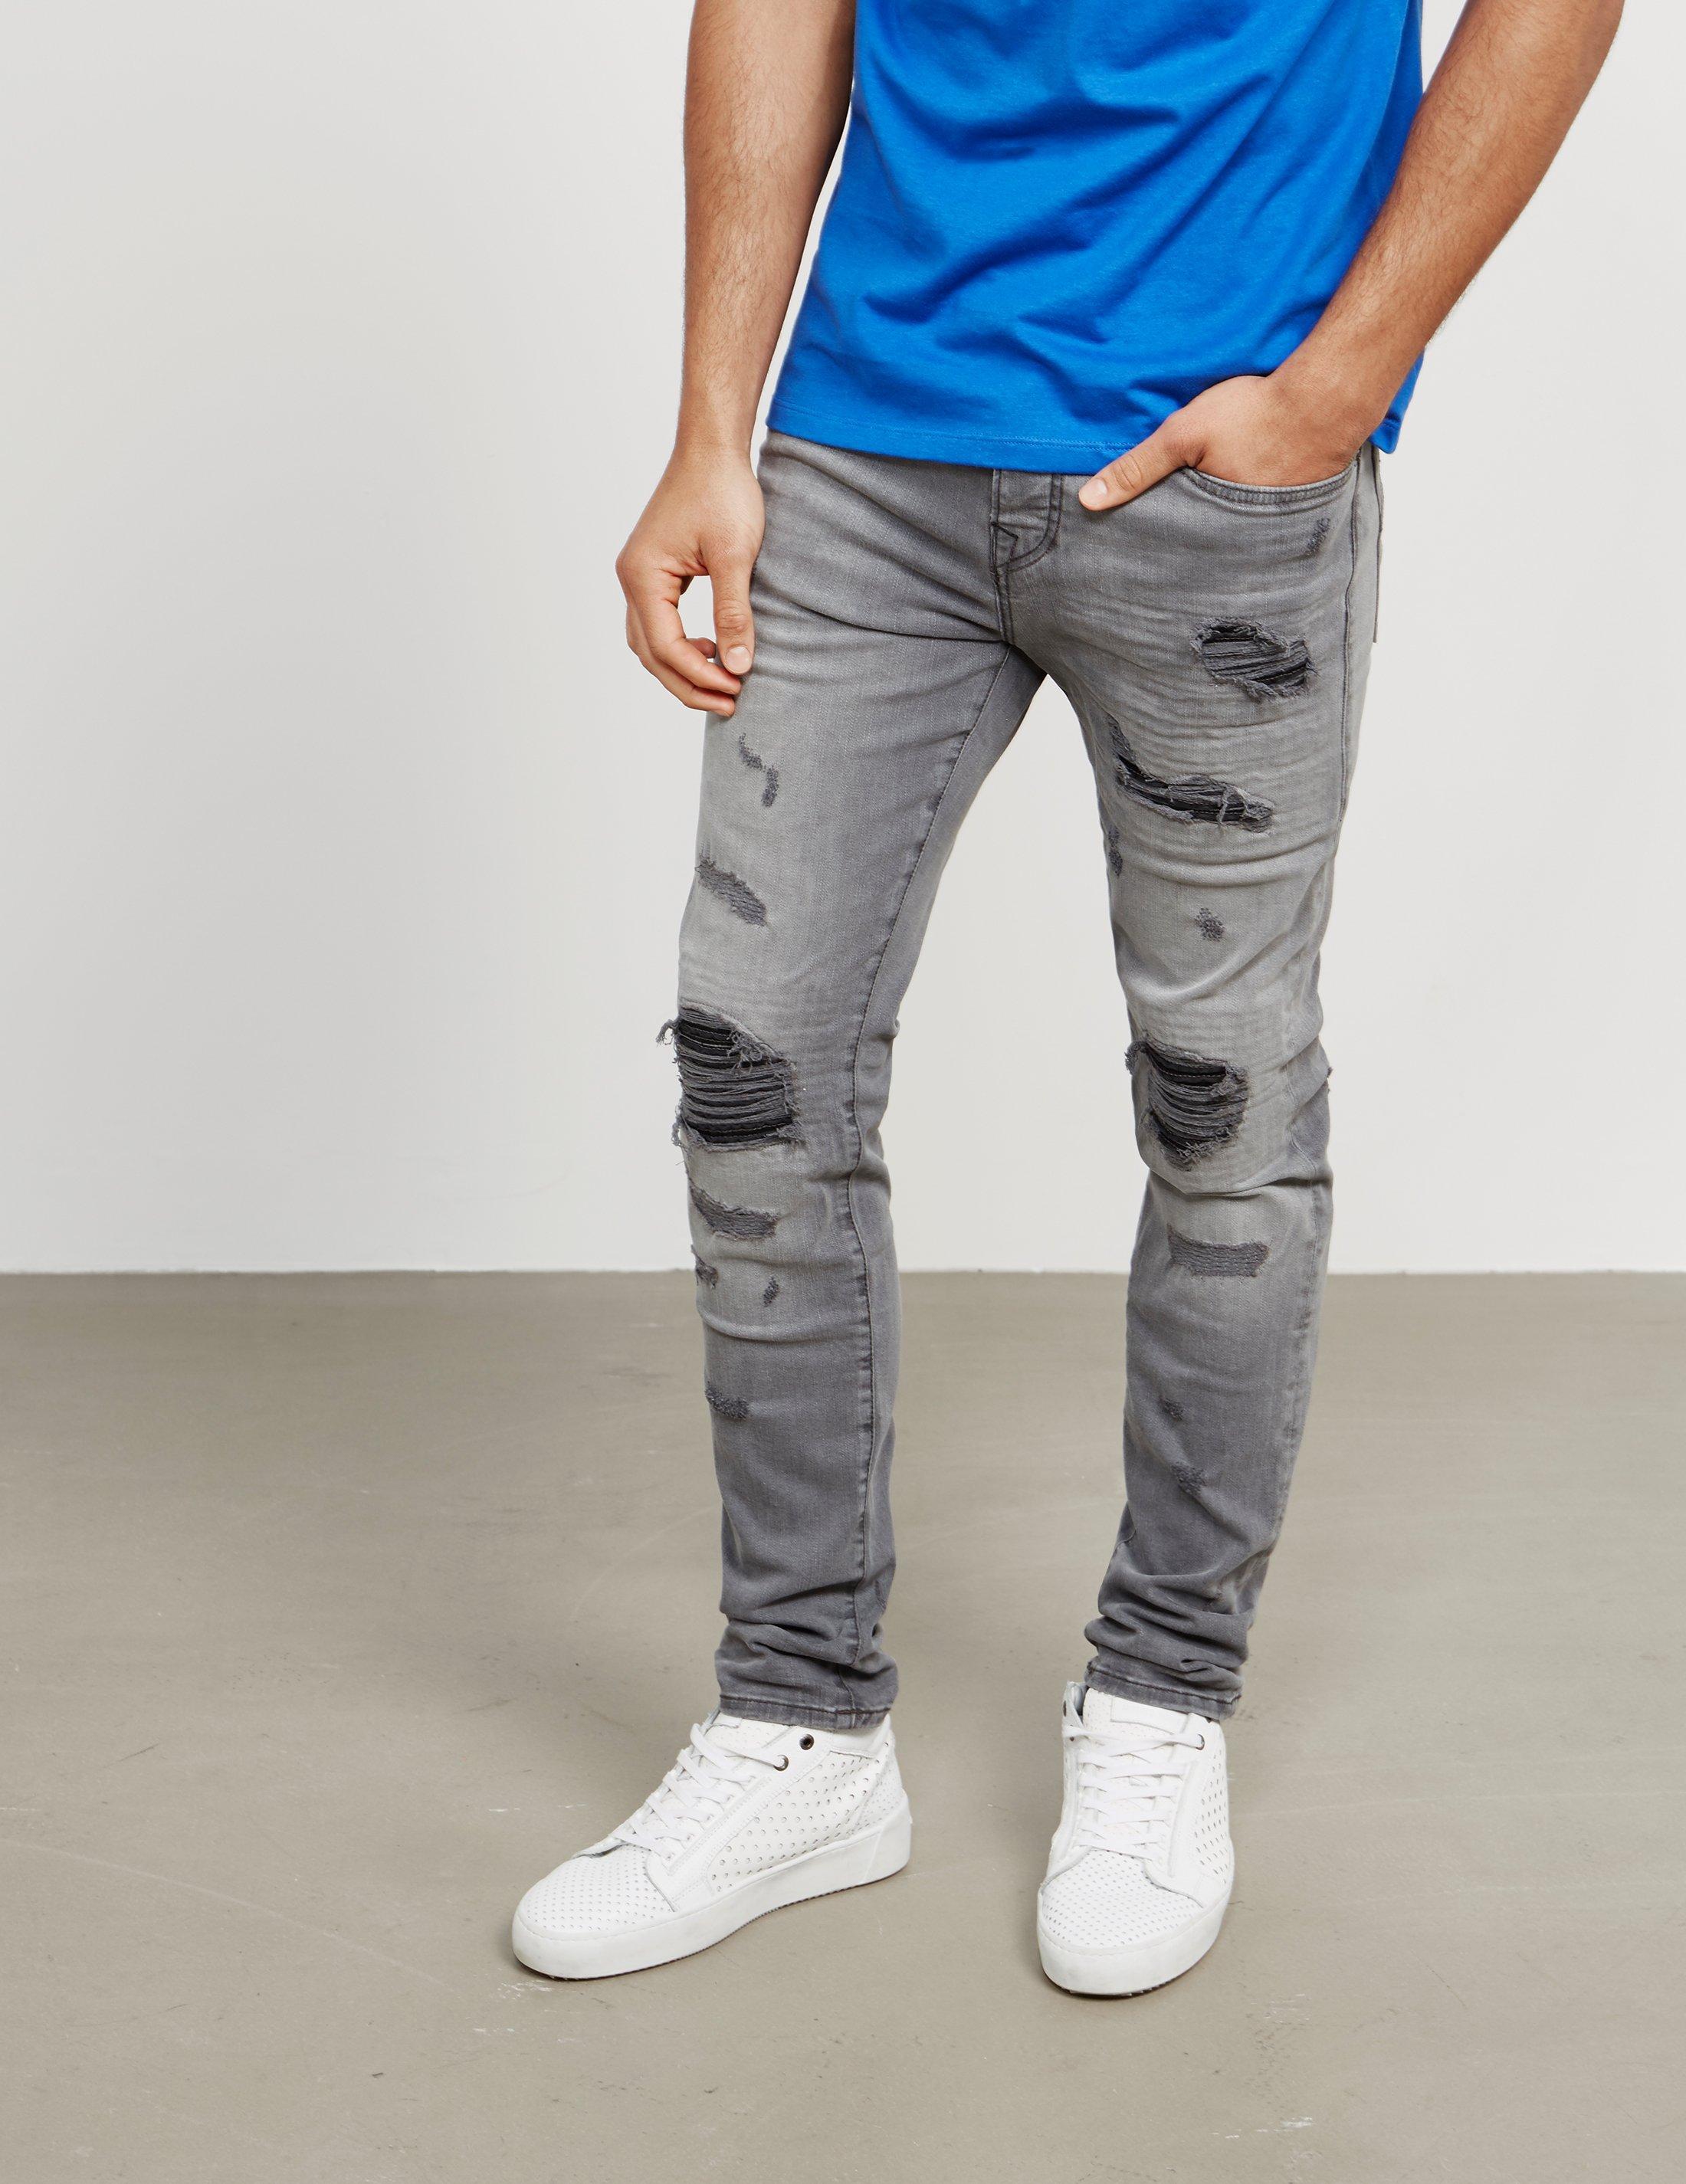 f10477f17976 Lyst - True Religion Mens Rocco Biker Skinny Jeans Black black in ...